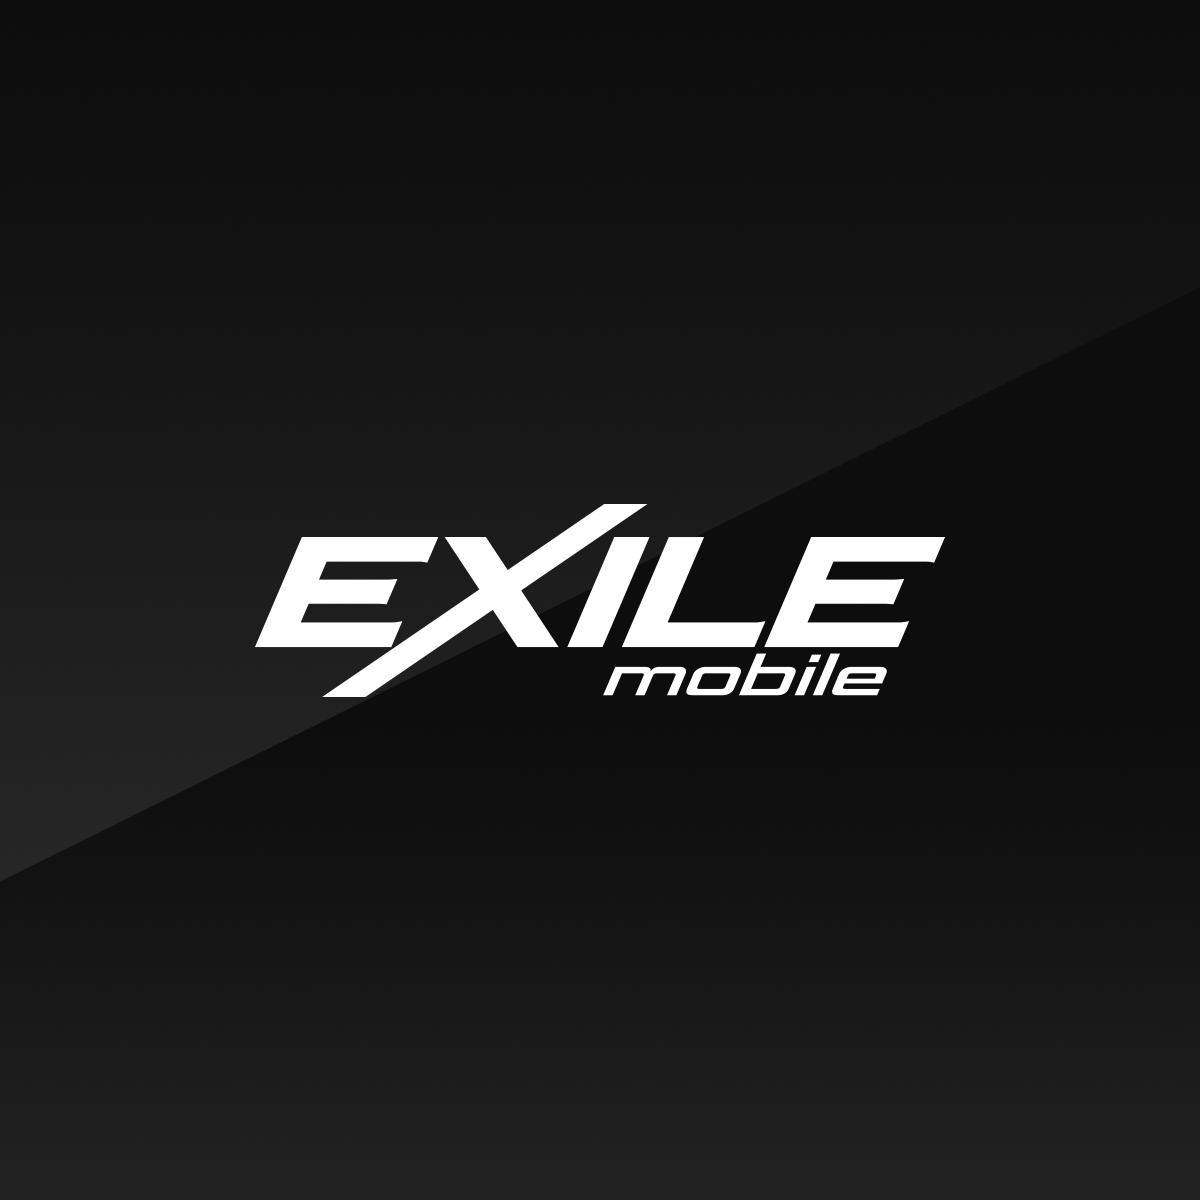 Exile Mobile